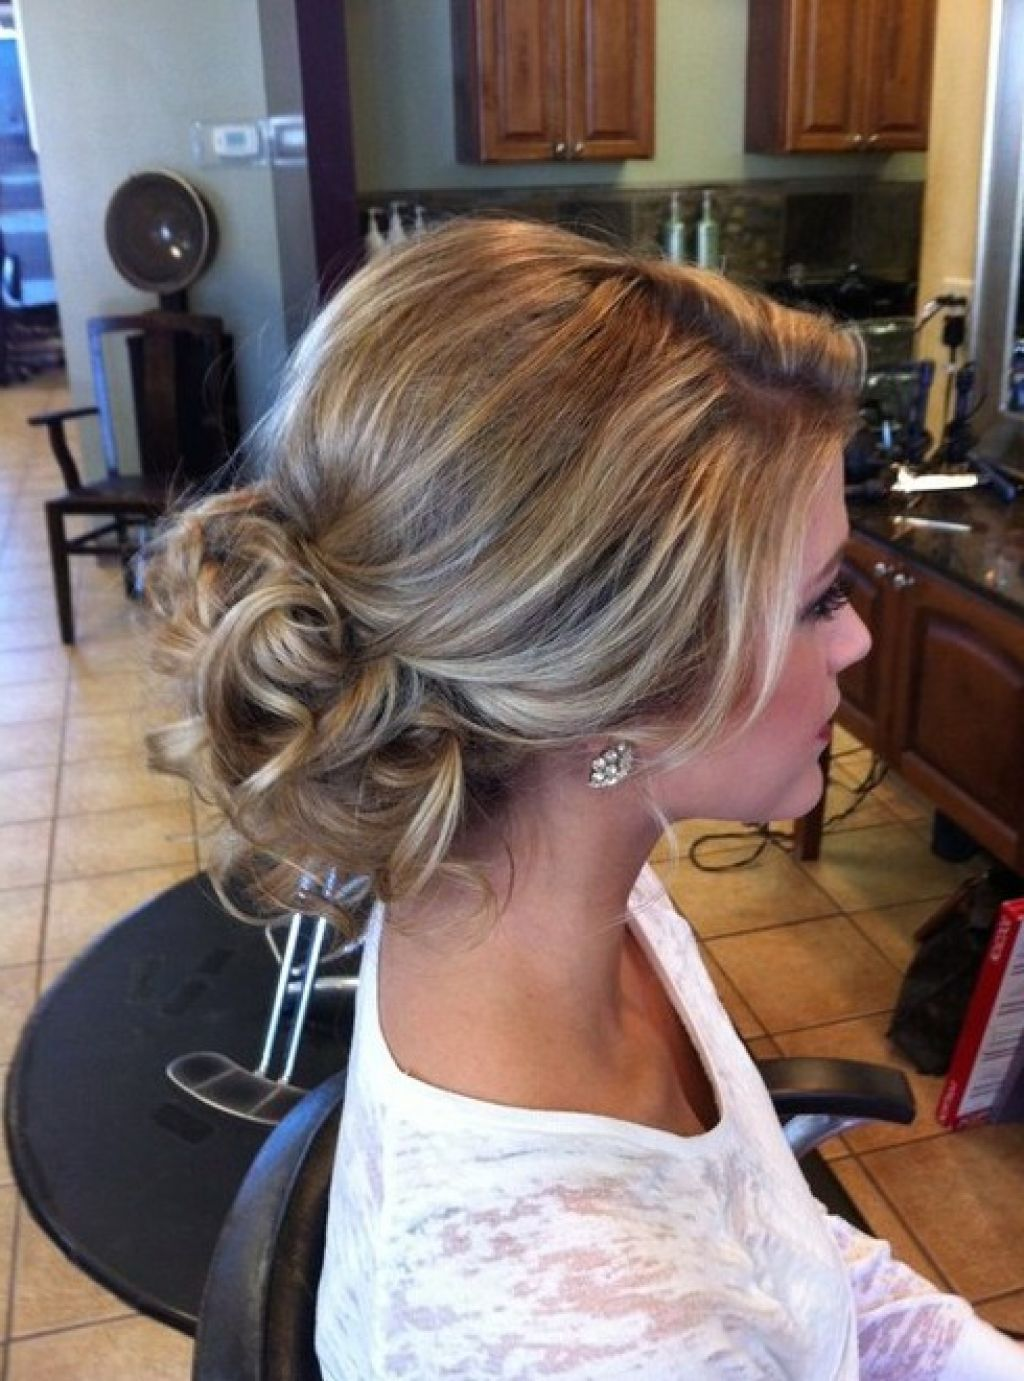 Casual Updos For Medium Length Hair Casual Updos For Medium Fine Hair On Medium Haircuts Long Hair Updo Hair Styles Updos For Medium Length Hair